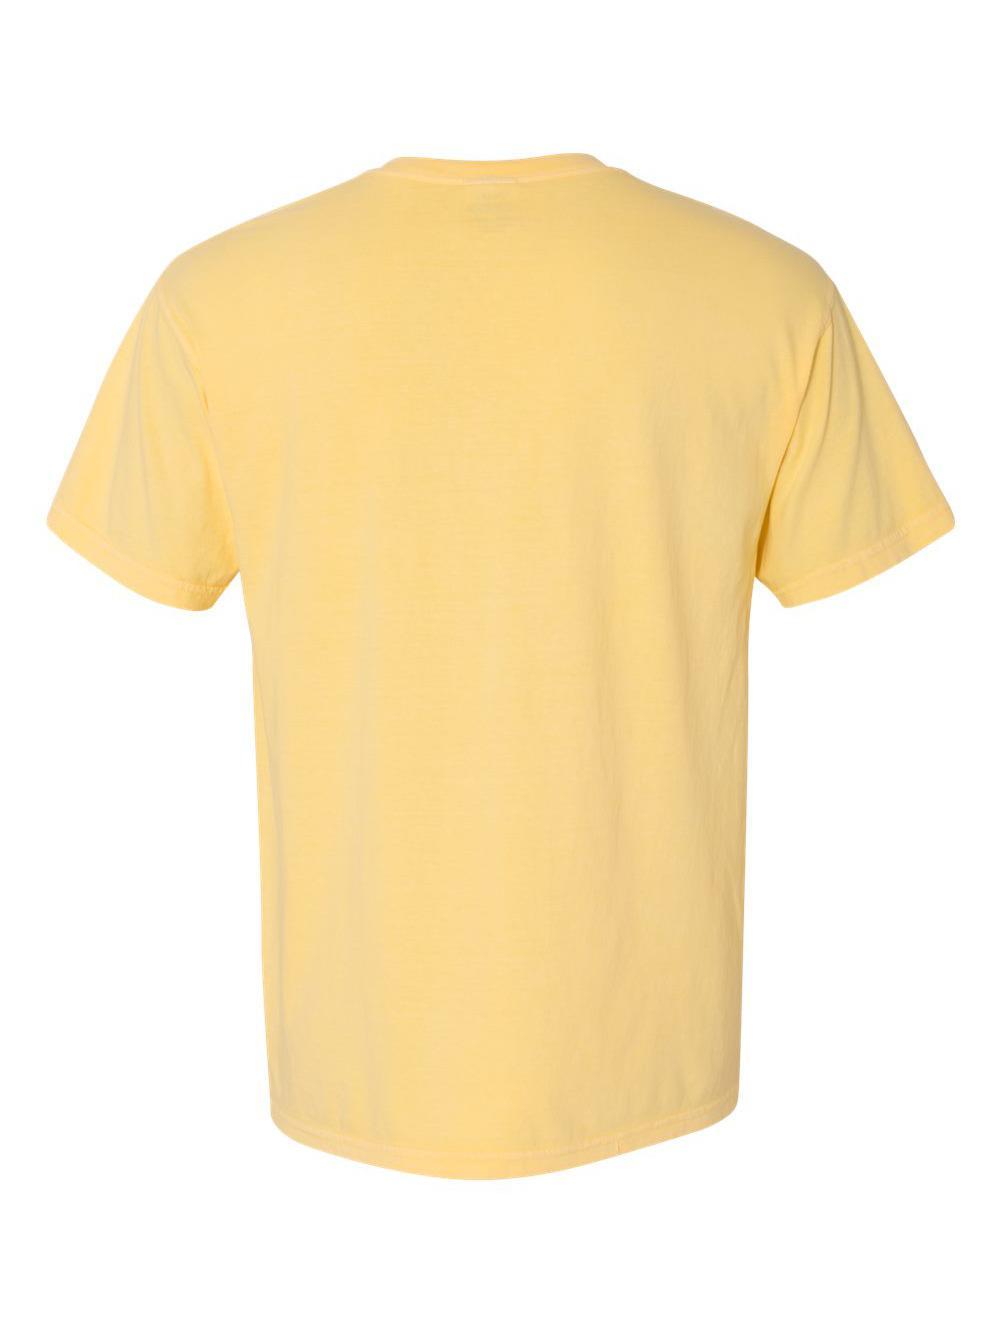 Comfort-Colors-Garment-Dyed-Heavyweight-Ringspun-Short-Sleeve-Shirt-1717 thumbnail 28